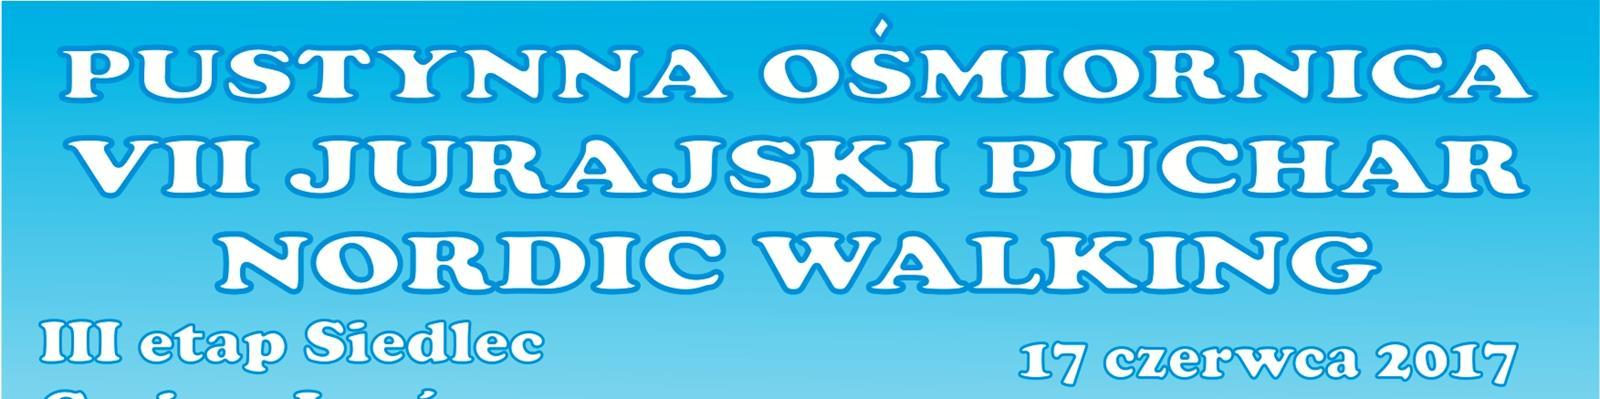 Pustynna_osmiornicag (Copy).jpg